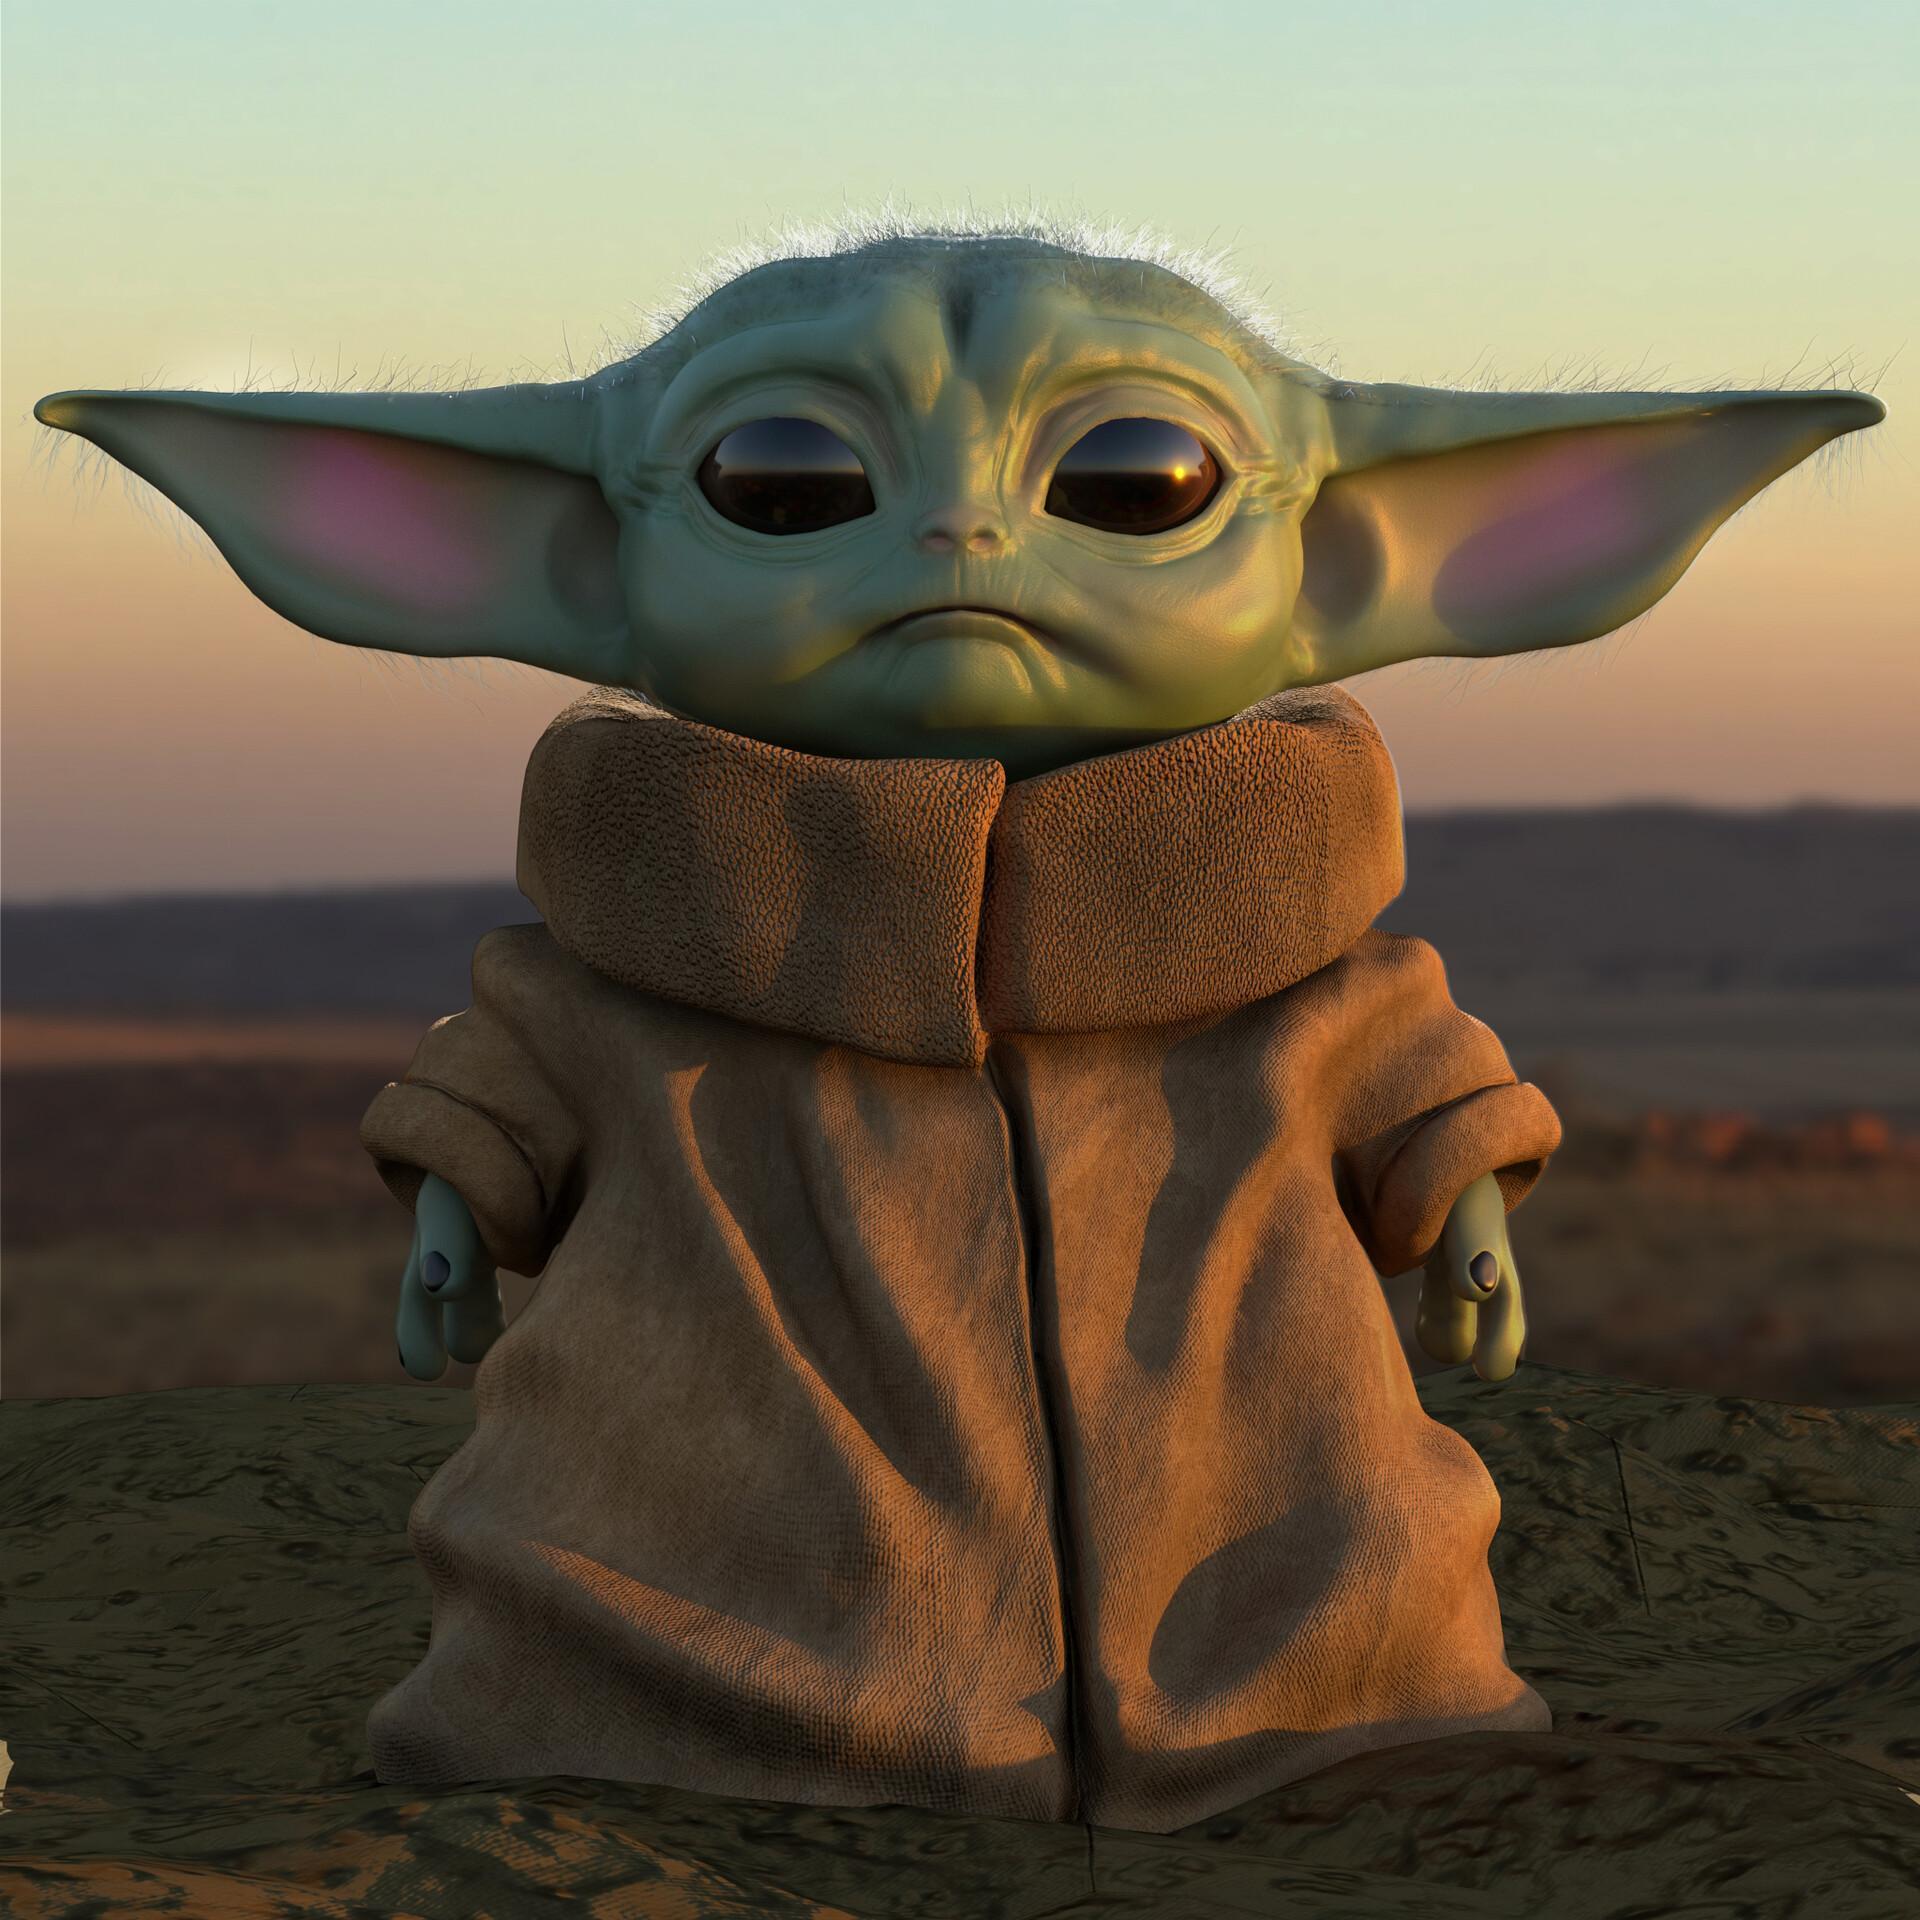 HD Baby Yoda Wallpaper & Mandalorian Wallpaper Für Android